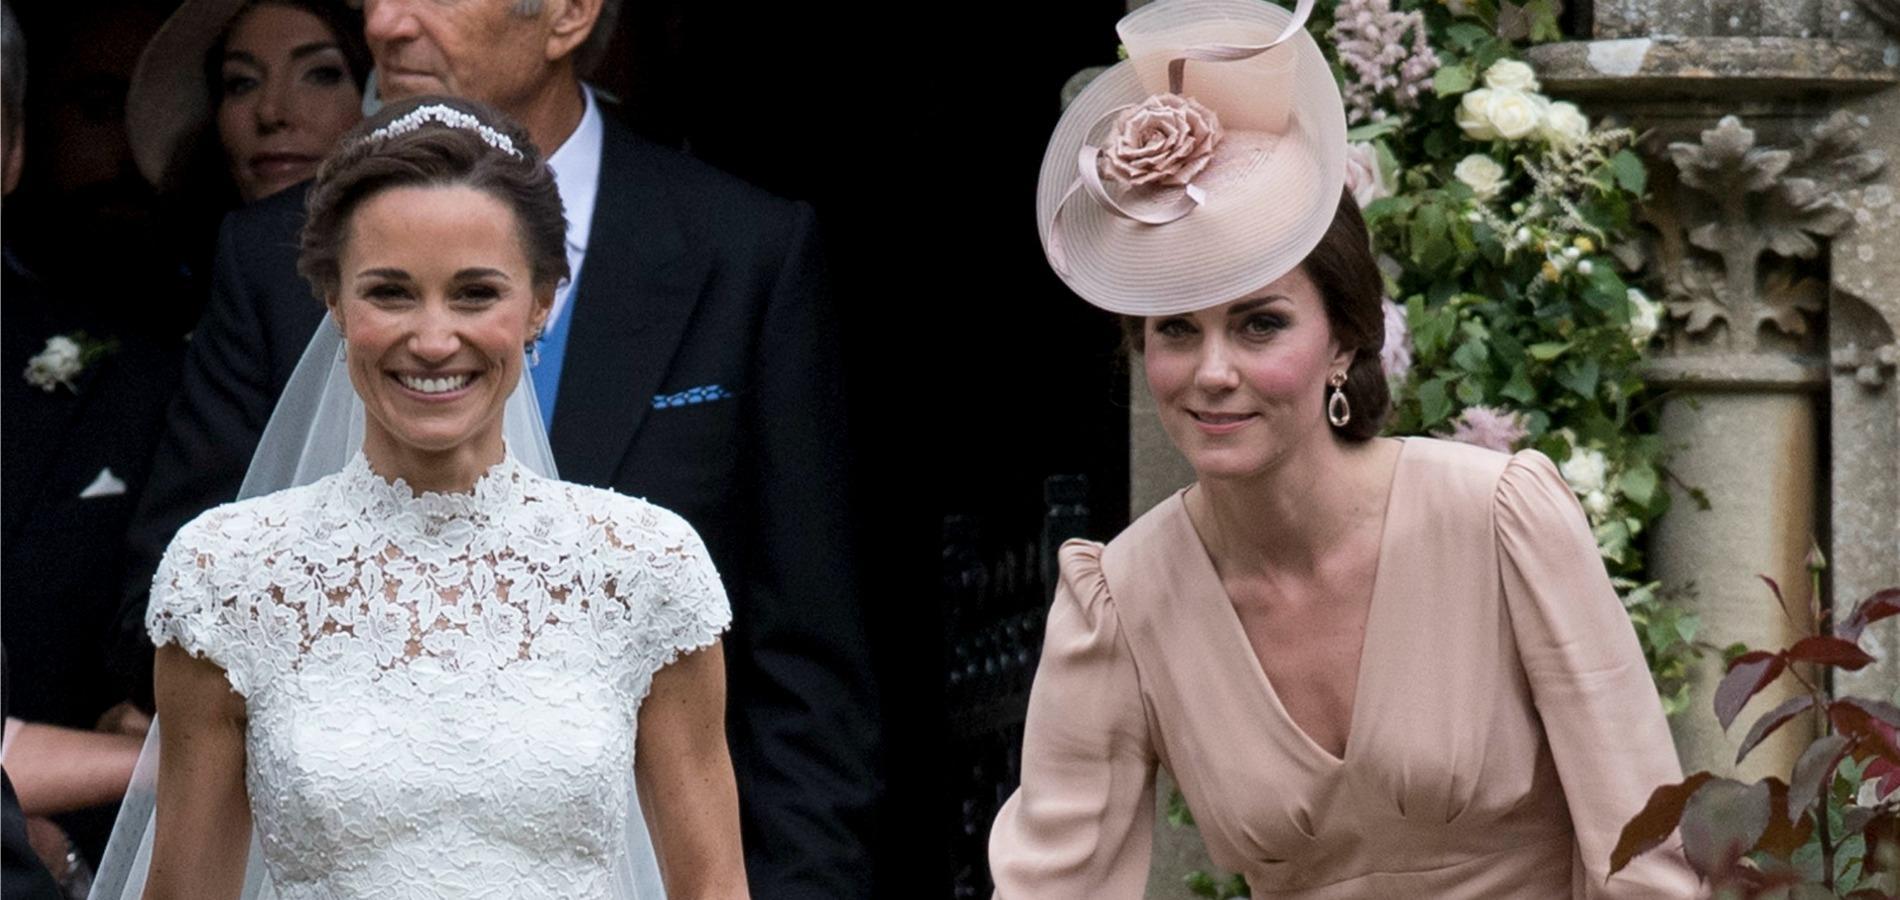 Kate middleton invit e parfaite au mariage de pippa en alexander mcqueen madame figaro - Photo de mariage ...